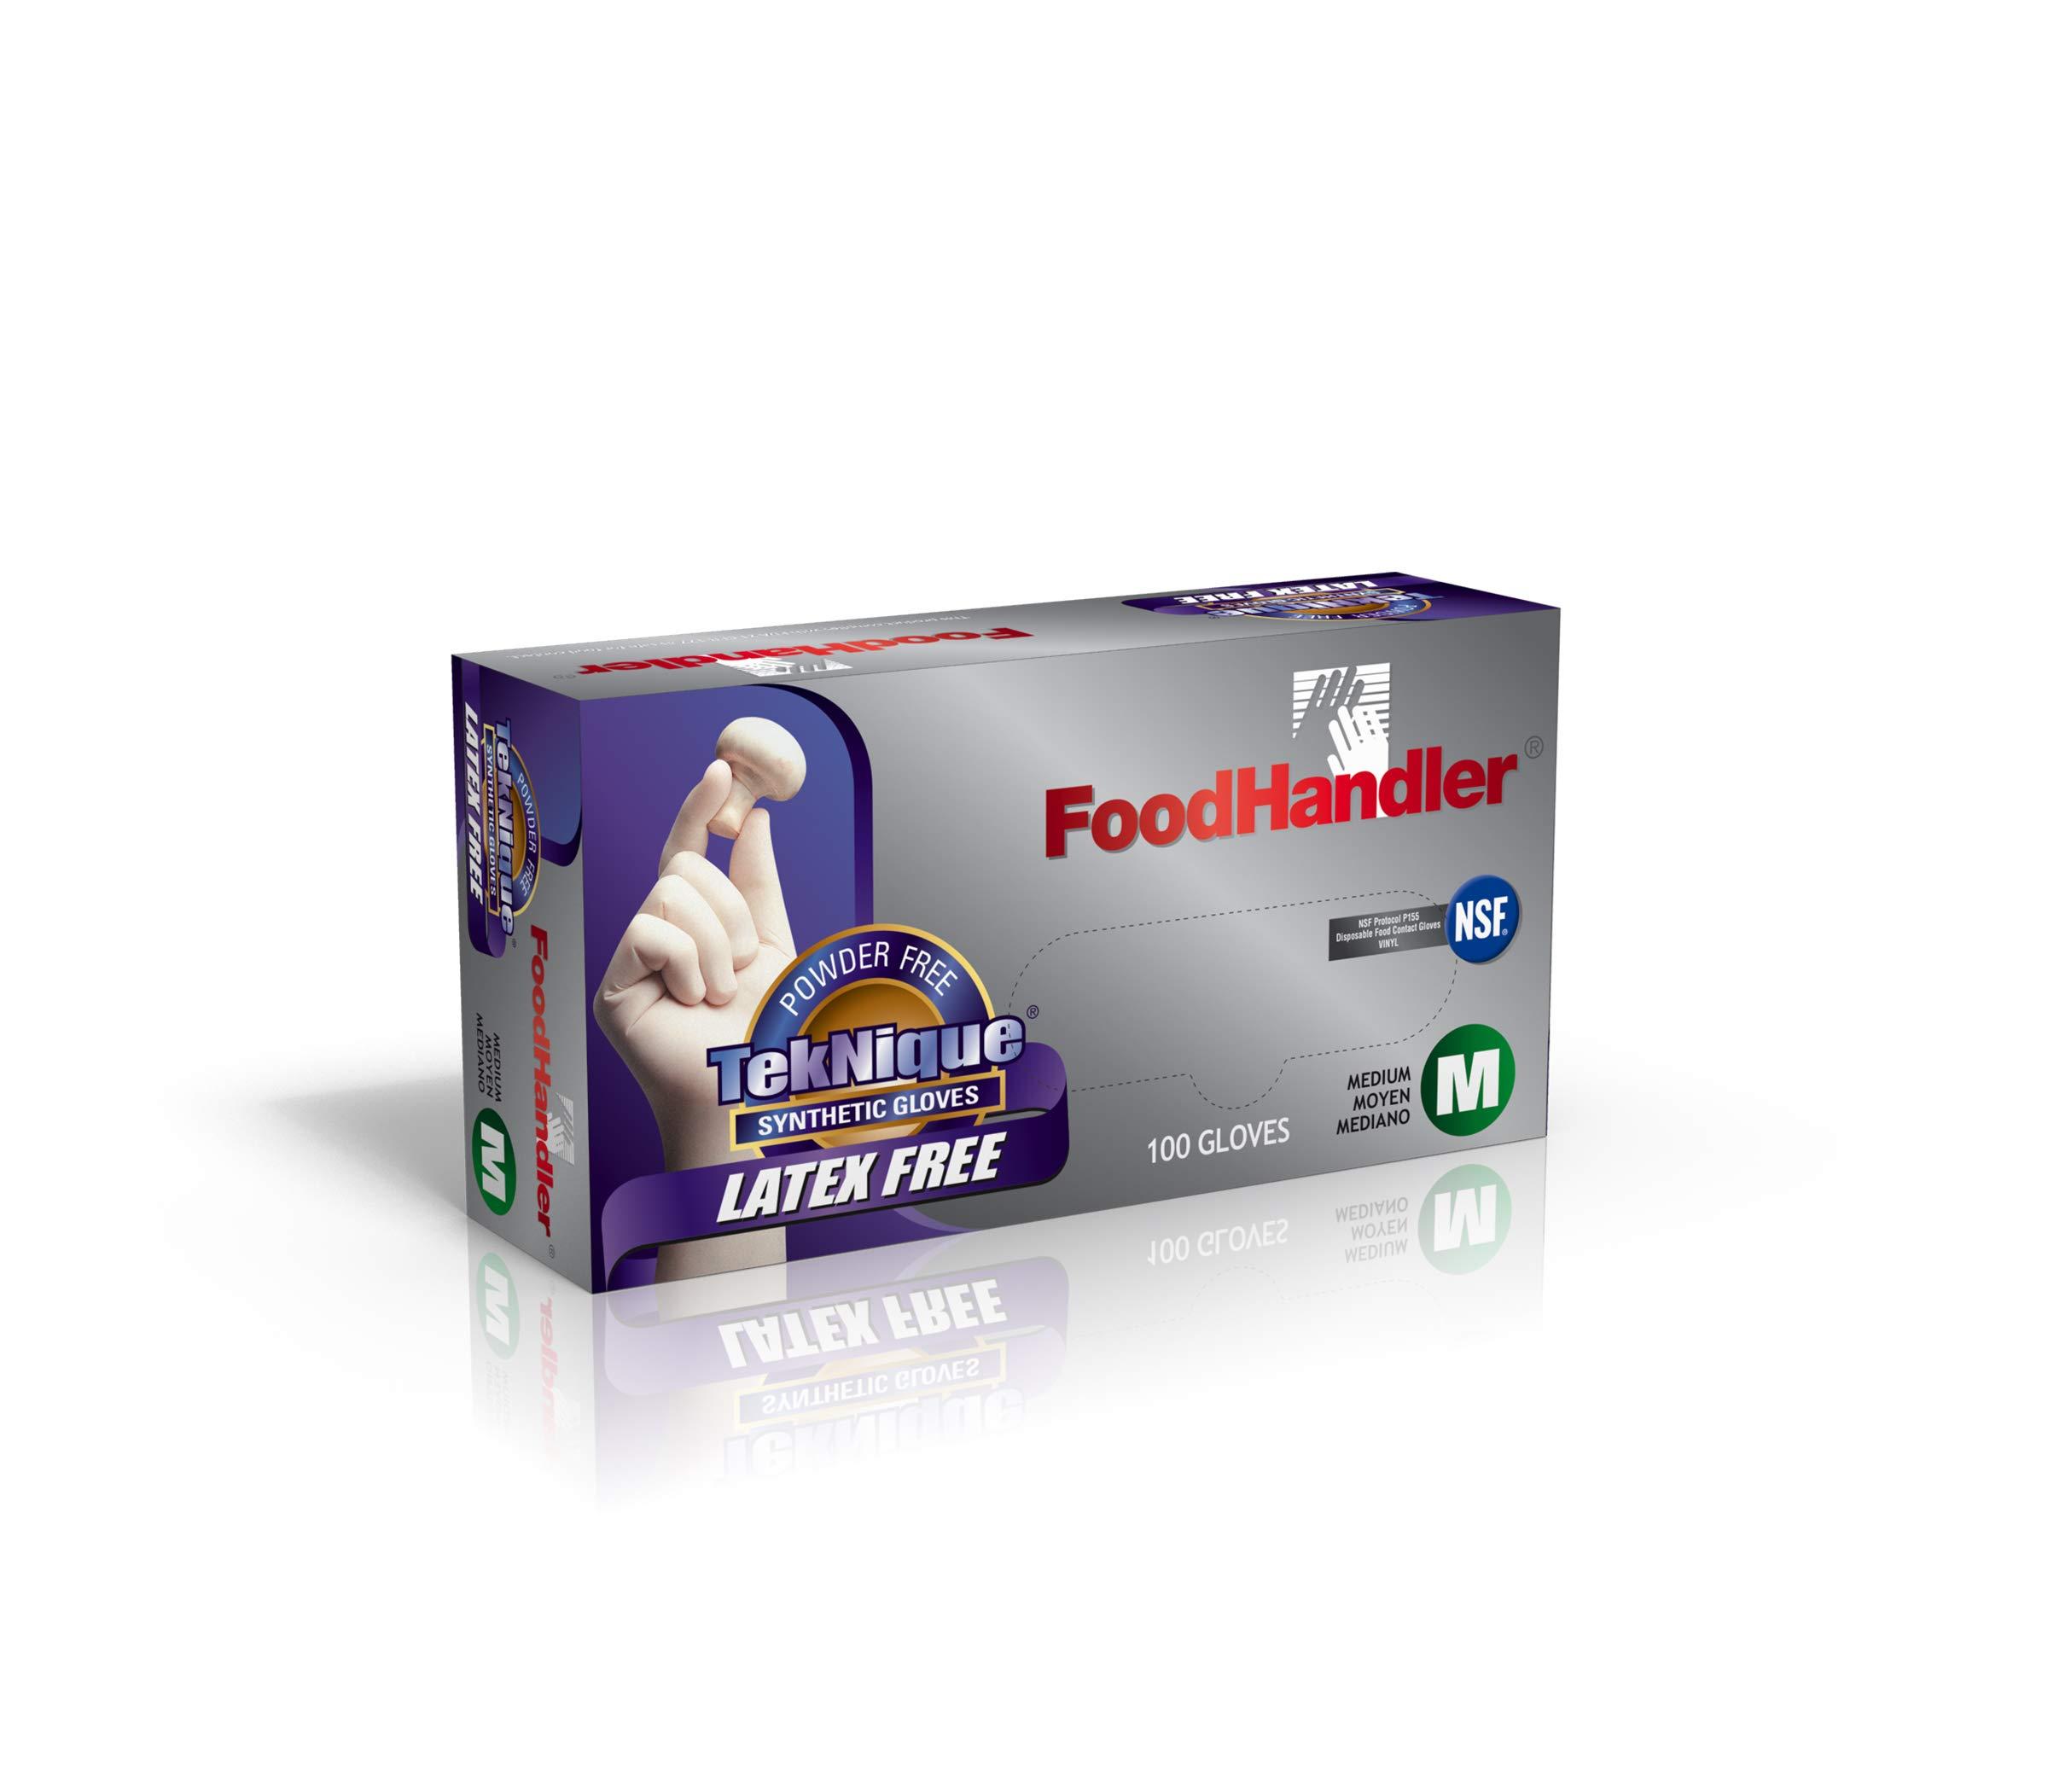 FoodHandler 103-TNQ14 FoodHandler TekNique Synthetic Vinyl MD Natural (Pack of 400)